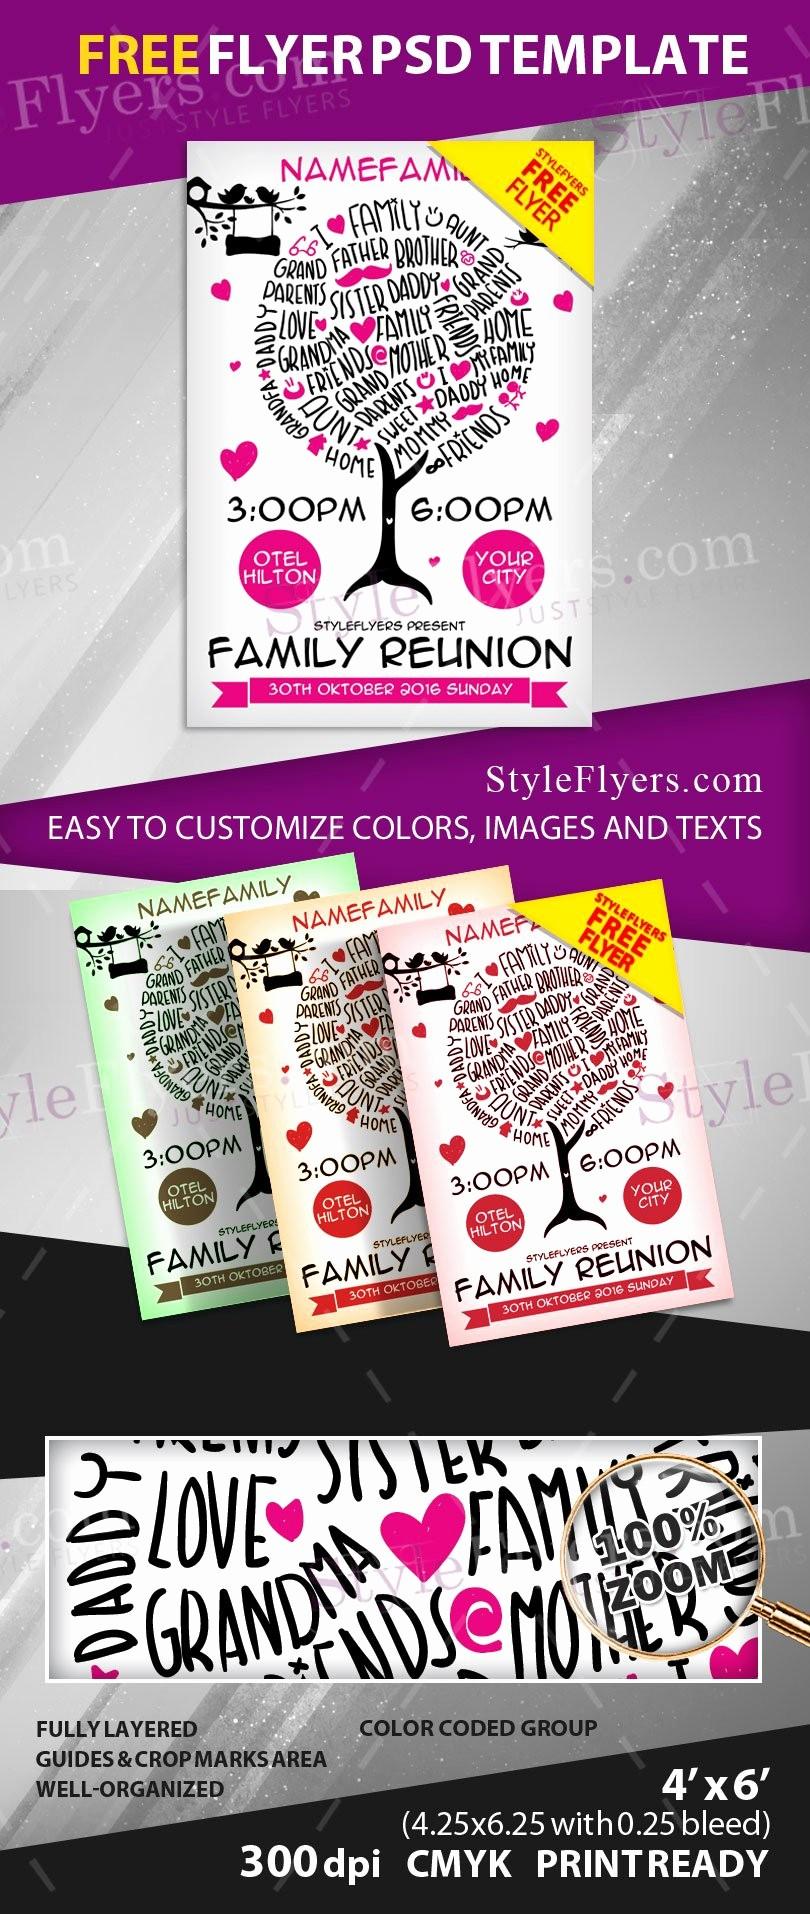 Free Family Reunion Flyer Templates Fresh Family Reunion Free Psd Flyer Template Free Download